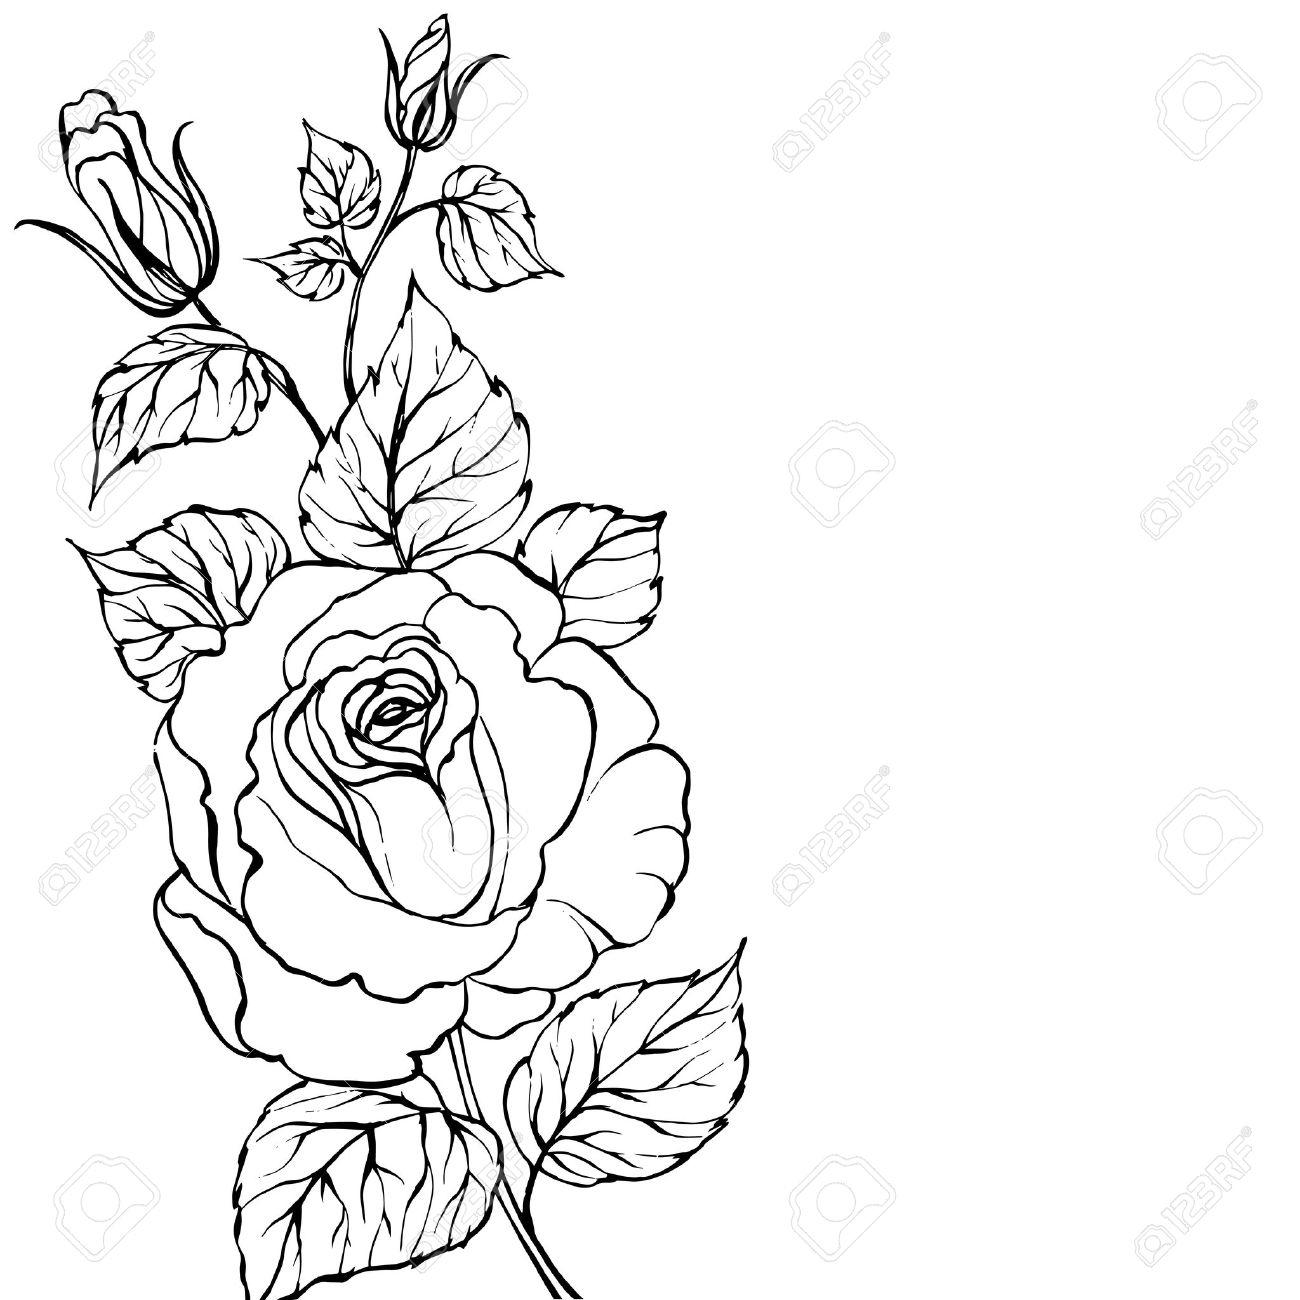 1300x1300 Rose Flower Outline Drawing Rose Tattoos Outline